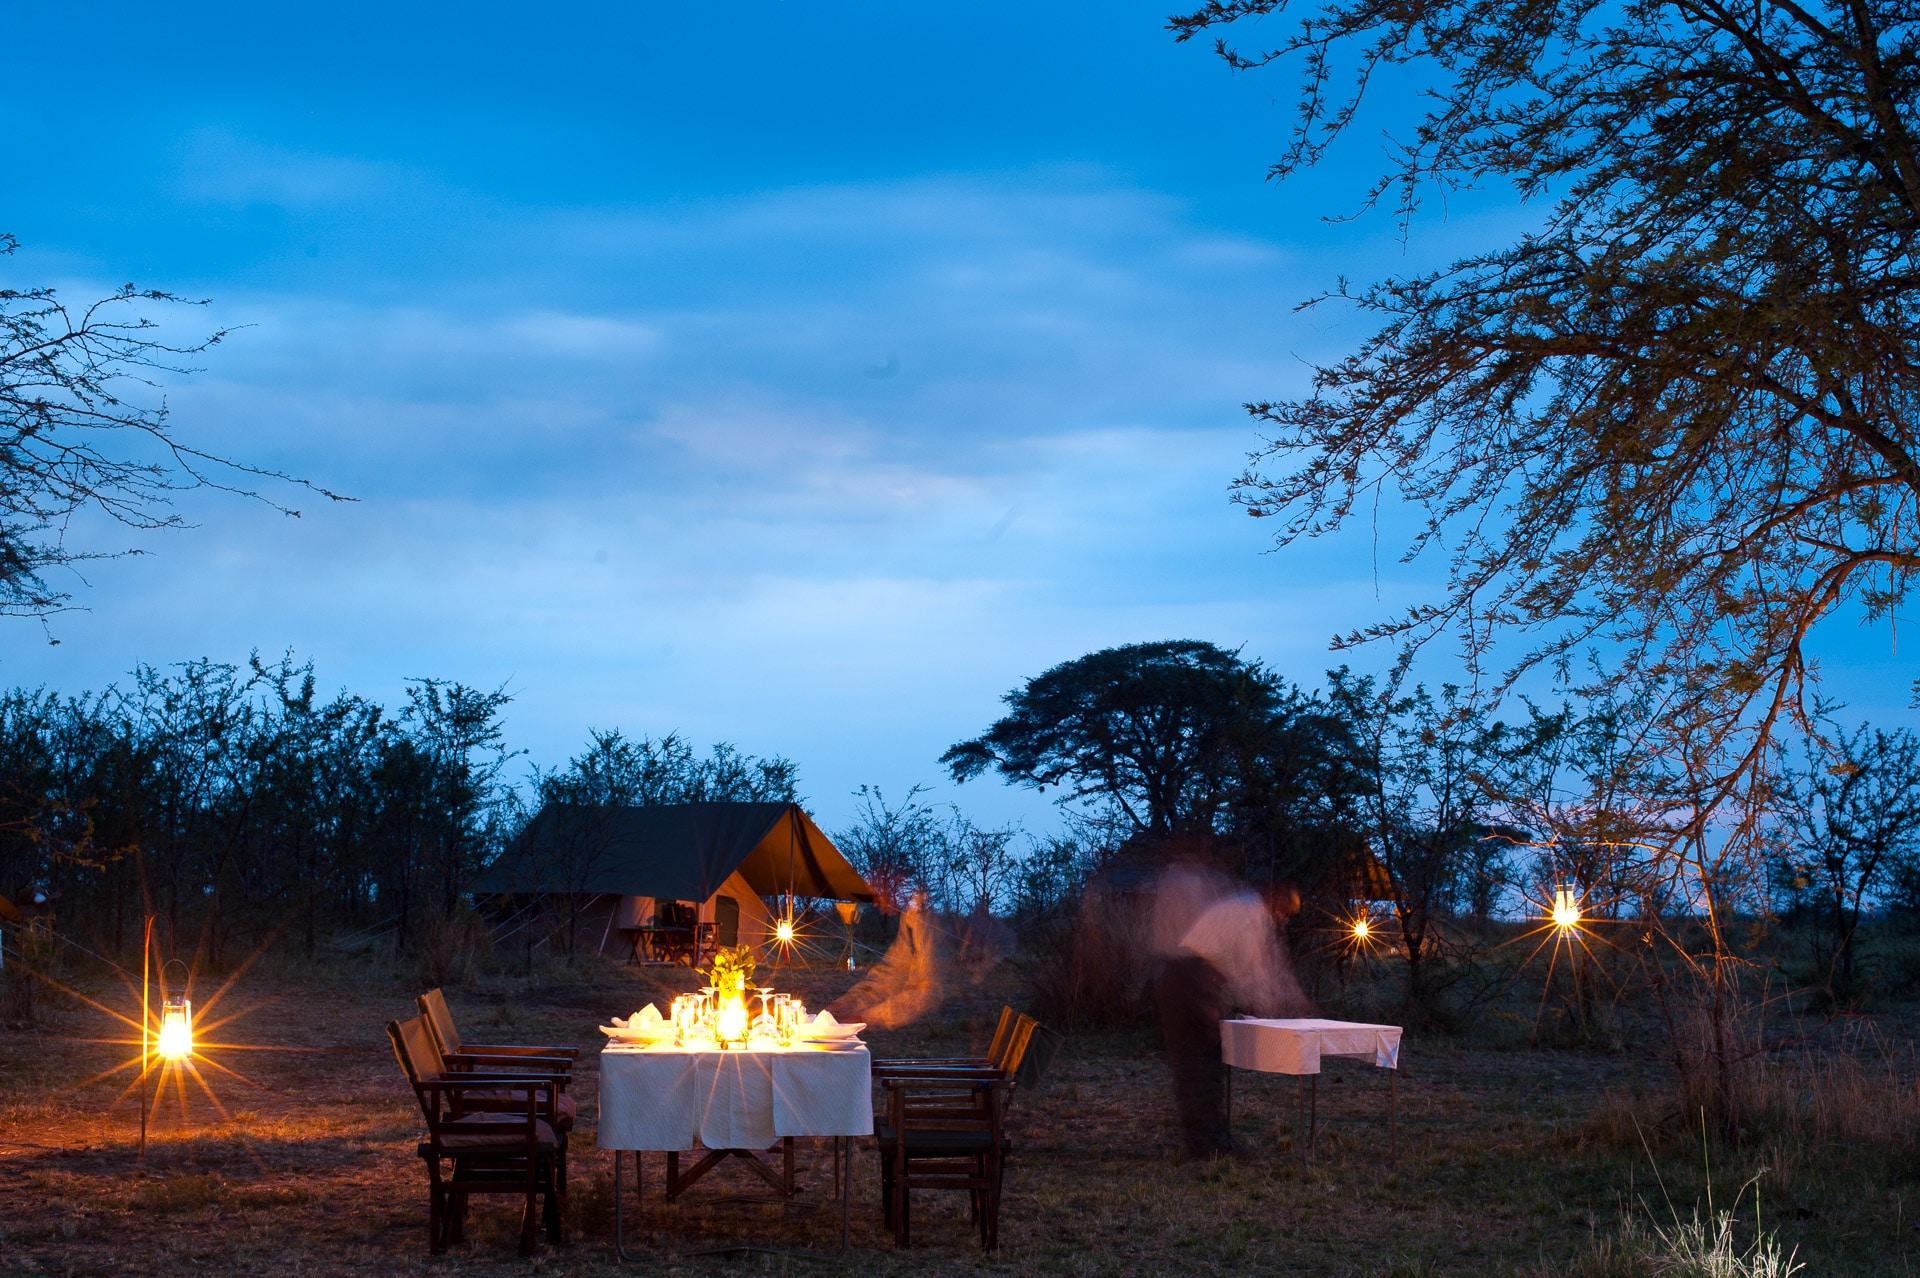 Select-Zelt-Safari-Serengeti-Tansania-Globetrotter-Select-GLenz-10